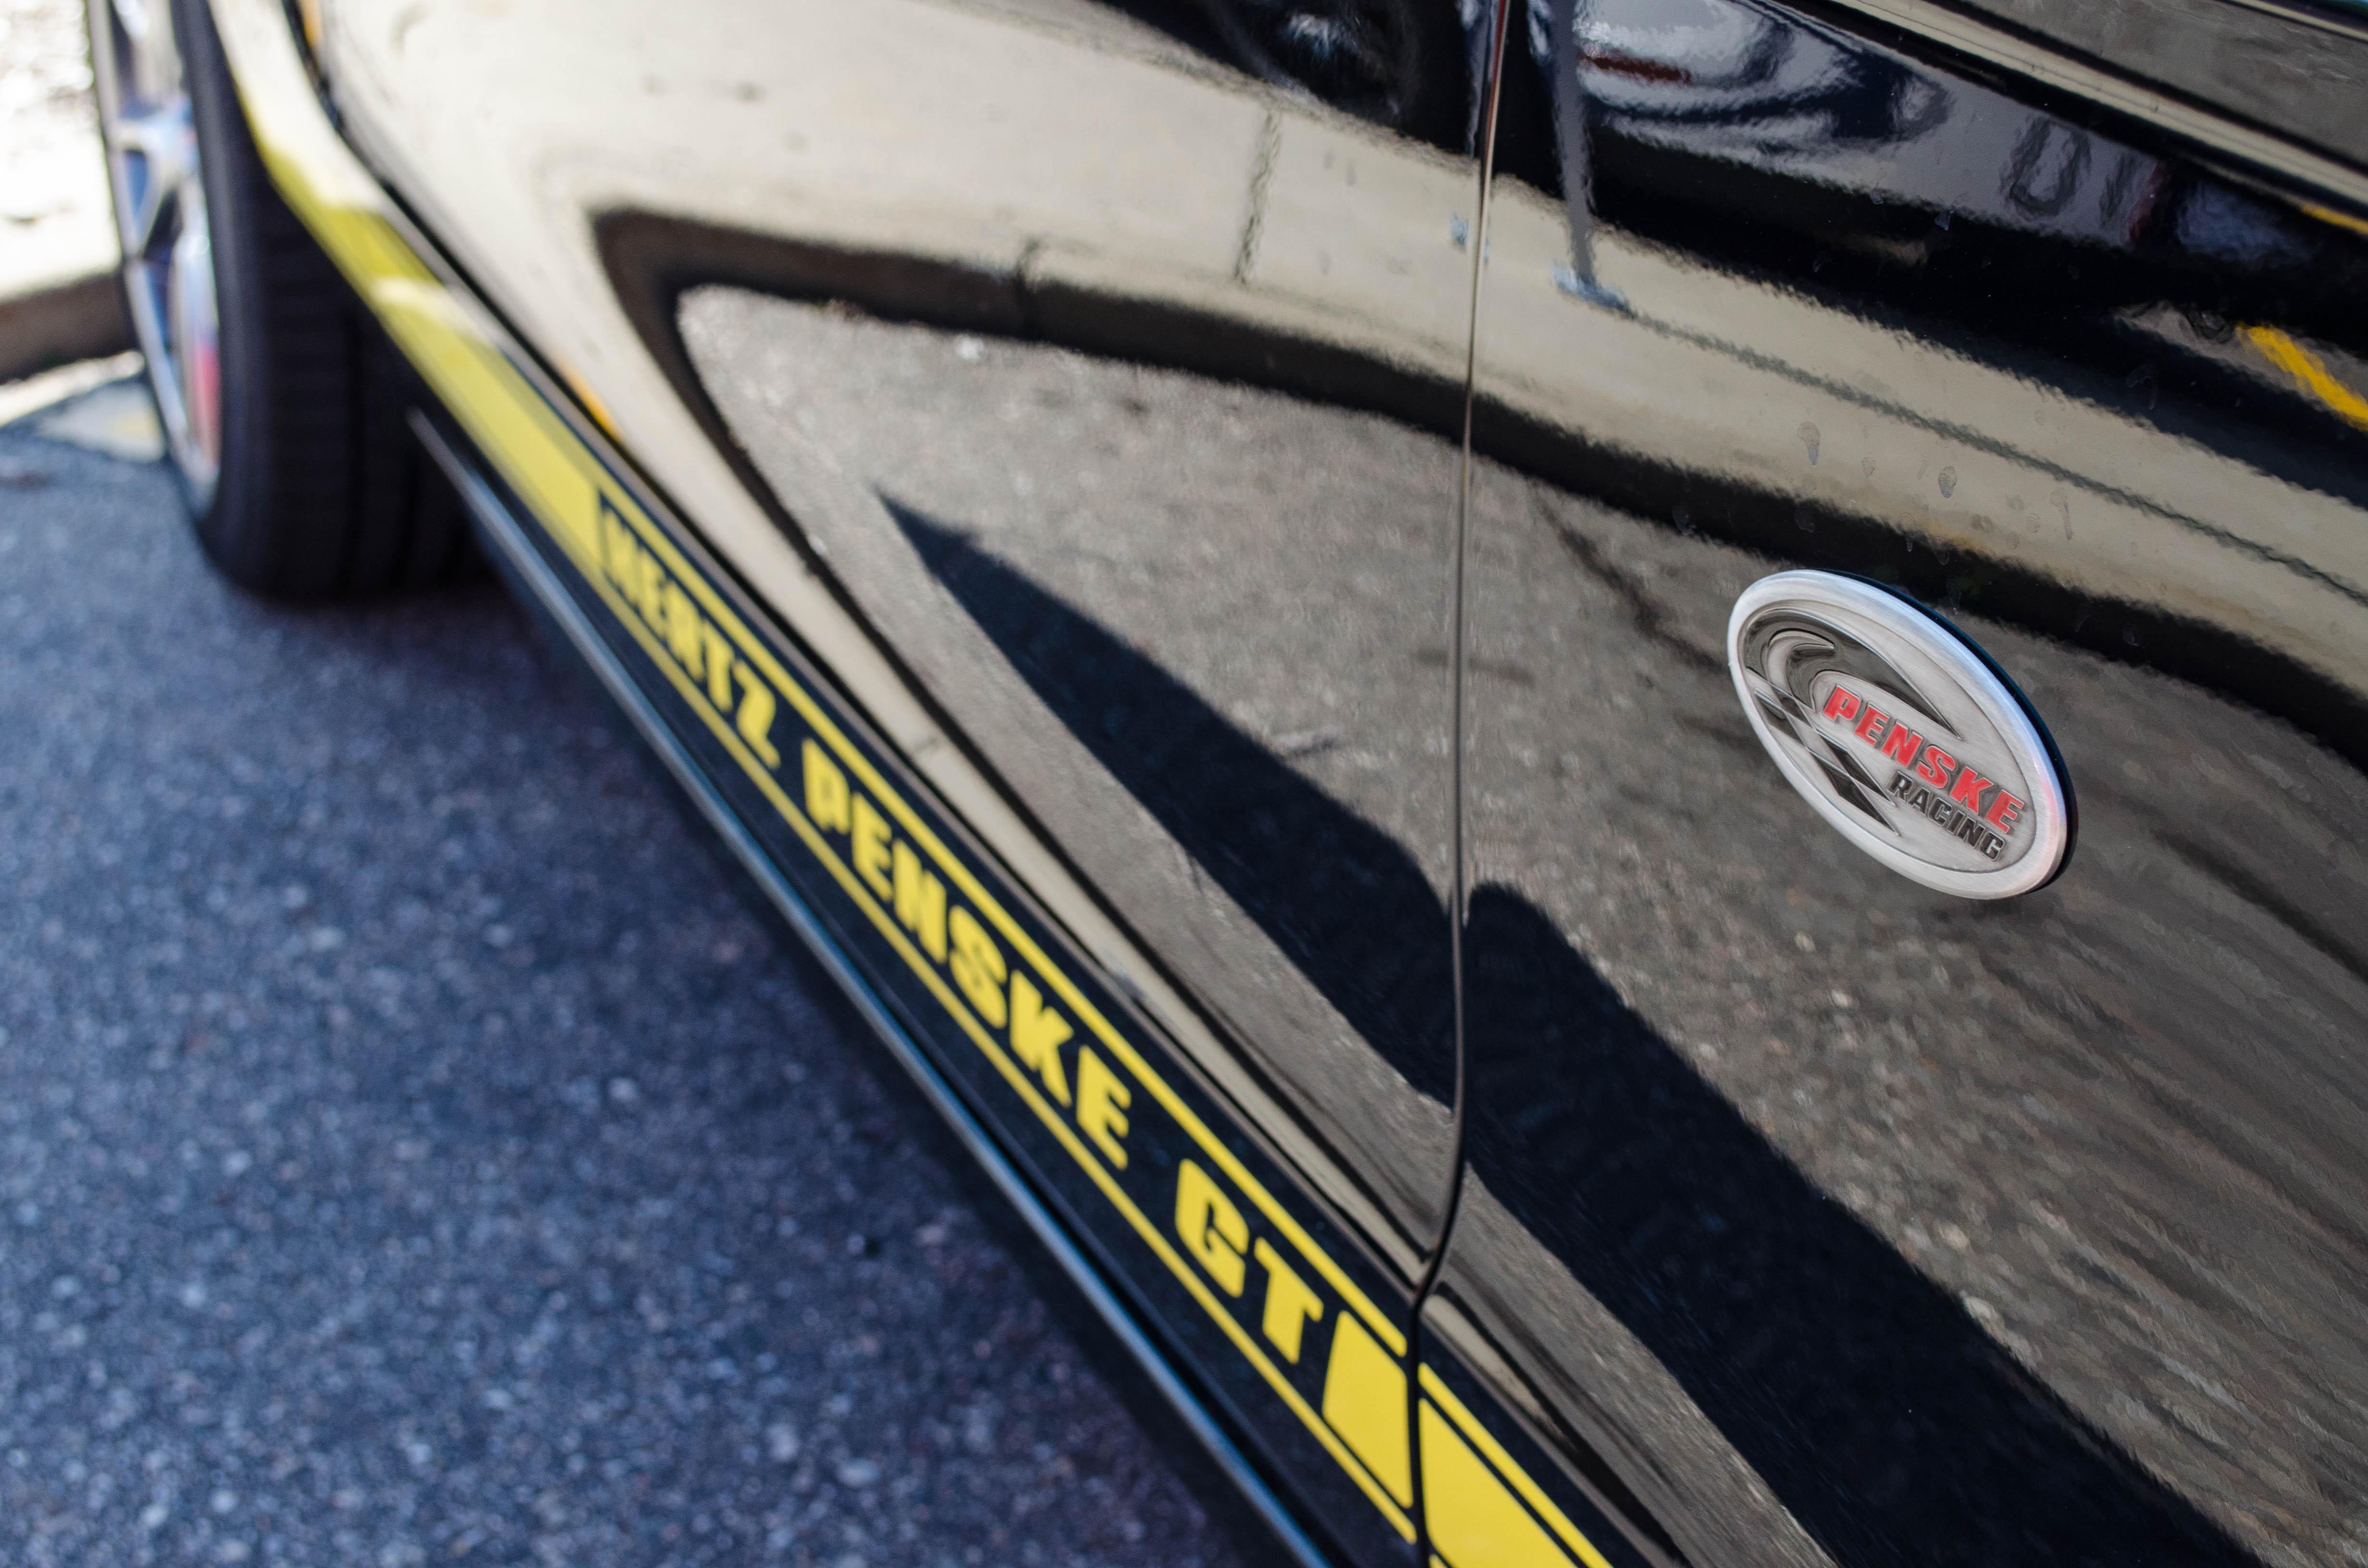 Texas Nissan Dealerships Hertz Penske GT (2 of 3) - Motor Review